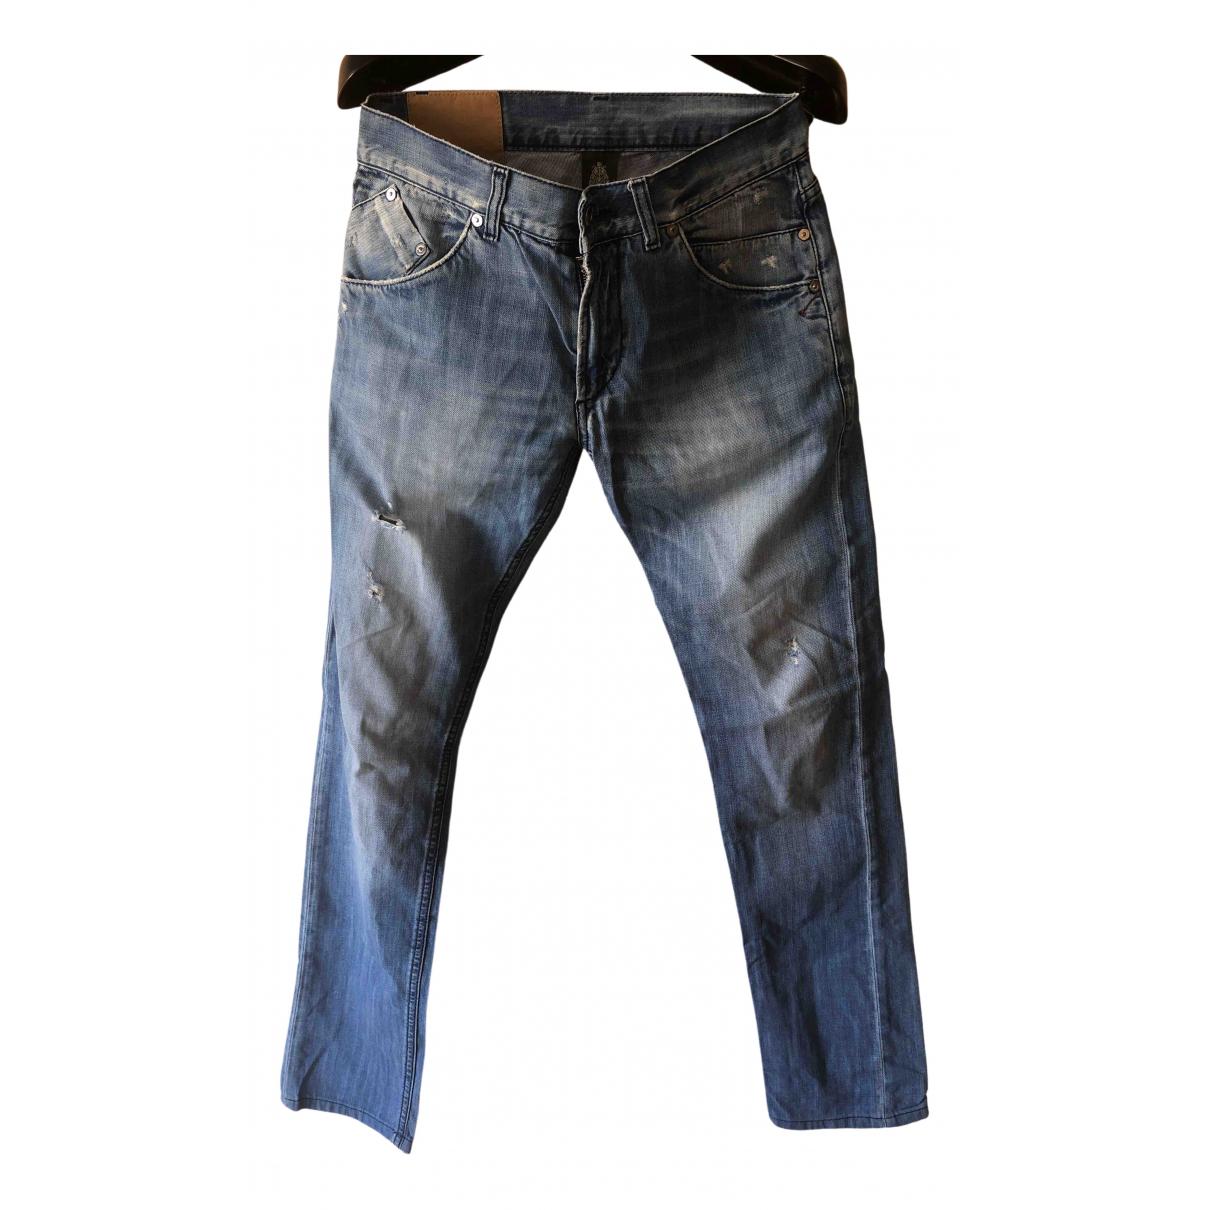 Dondup \N Cotton Jeans for Men 31 US